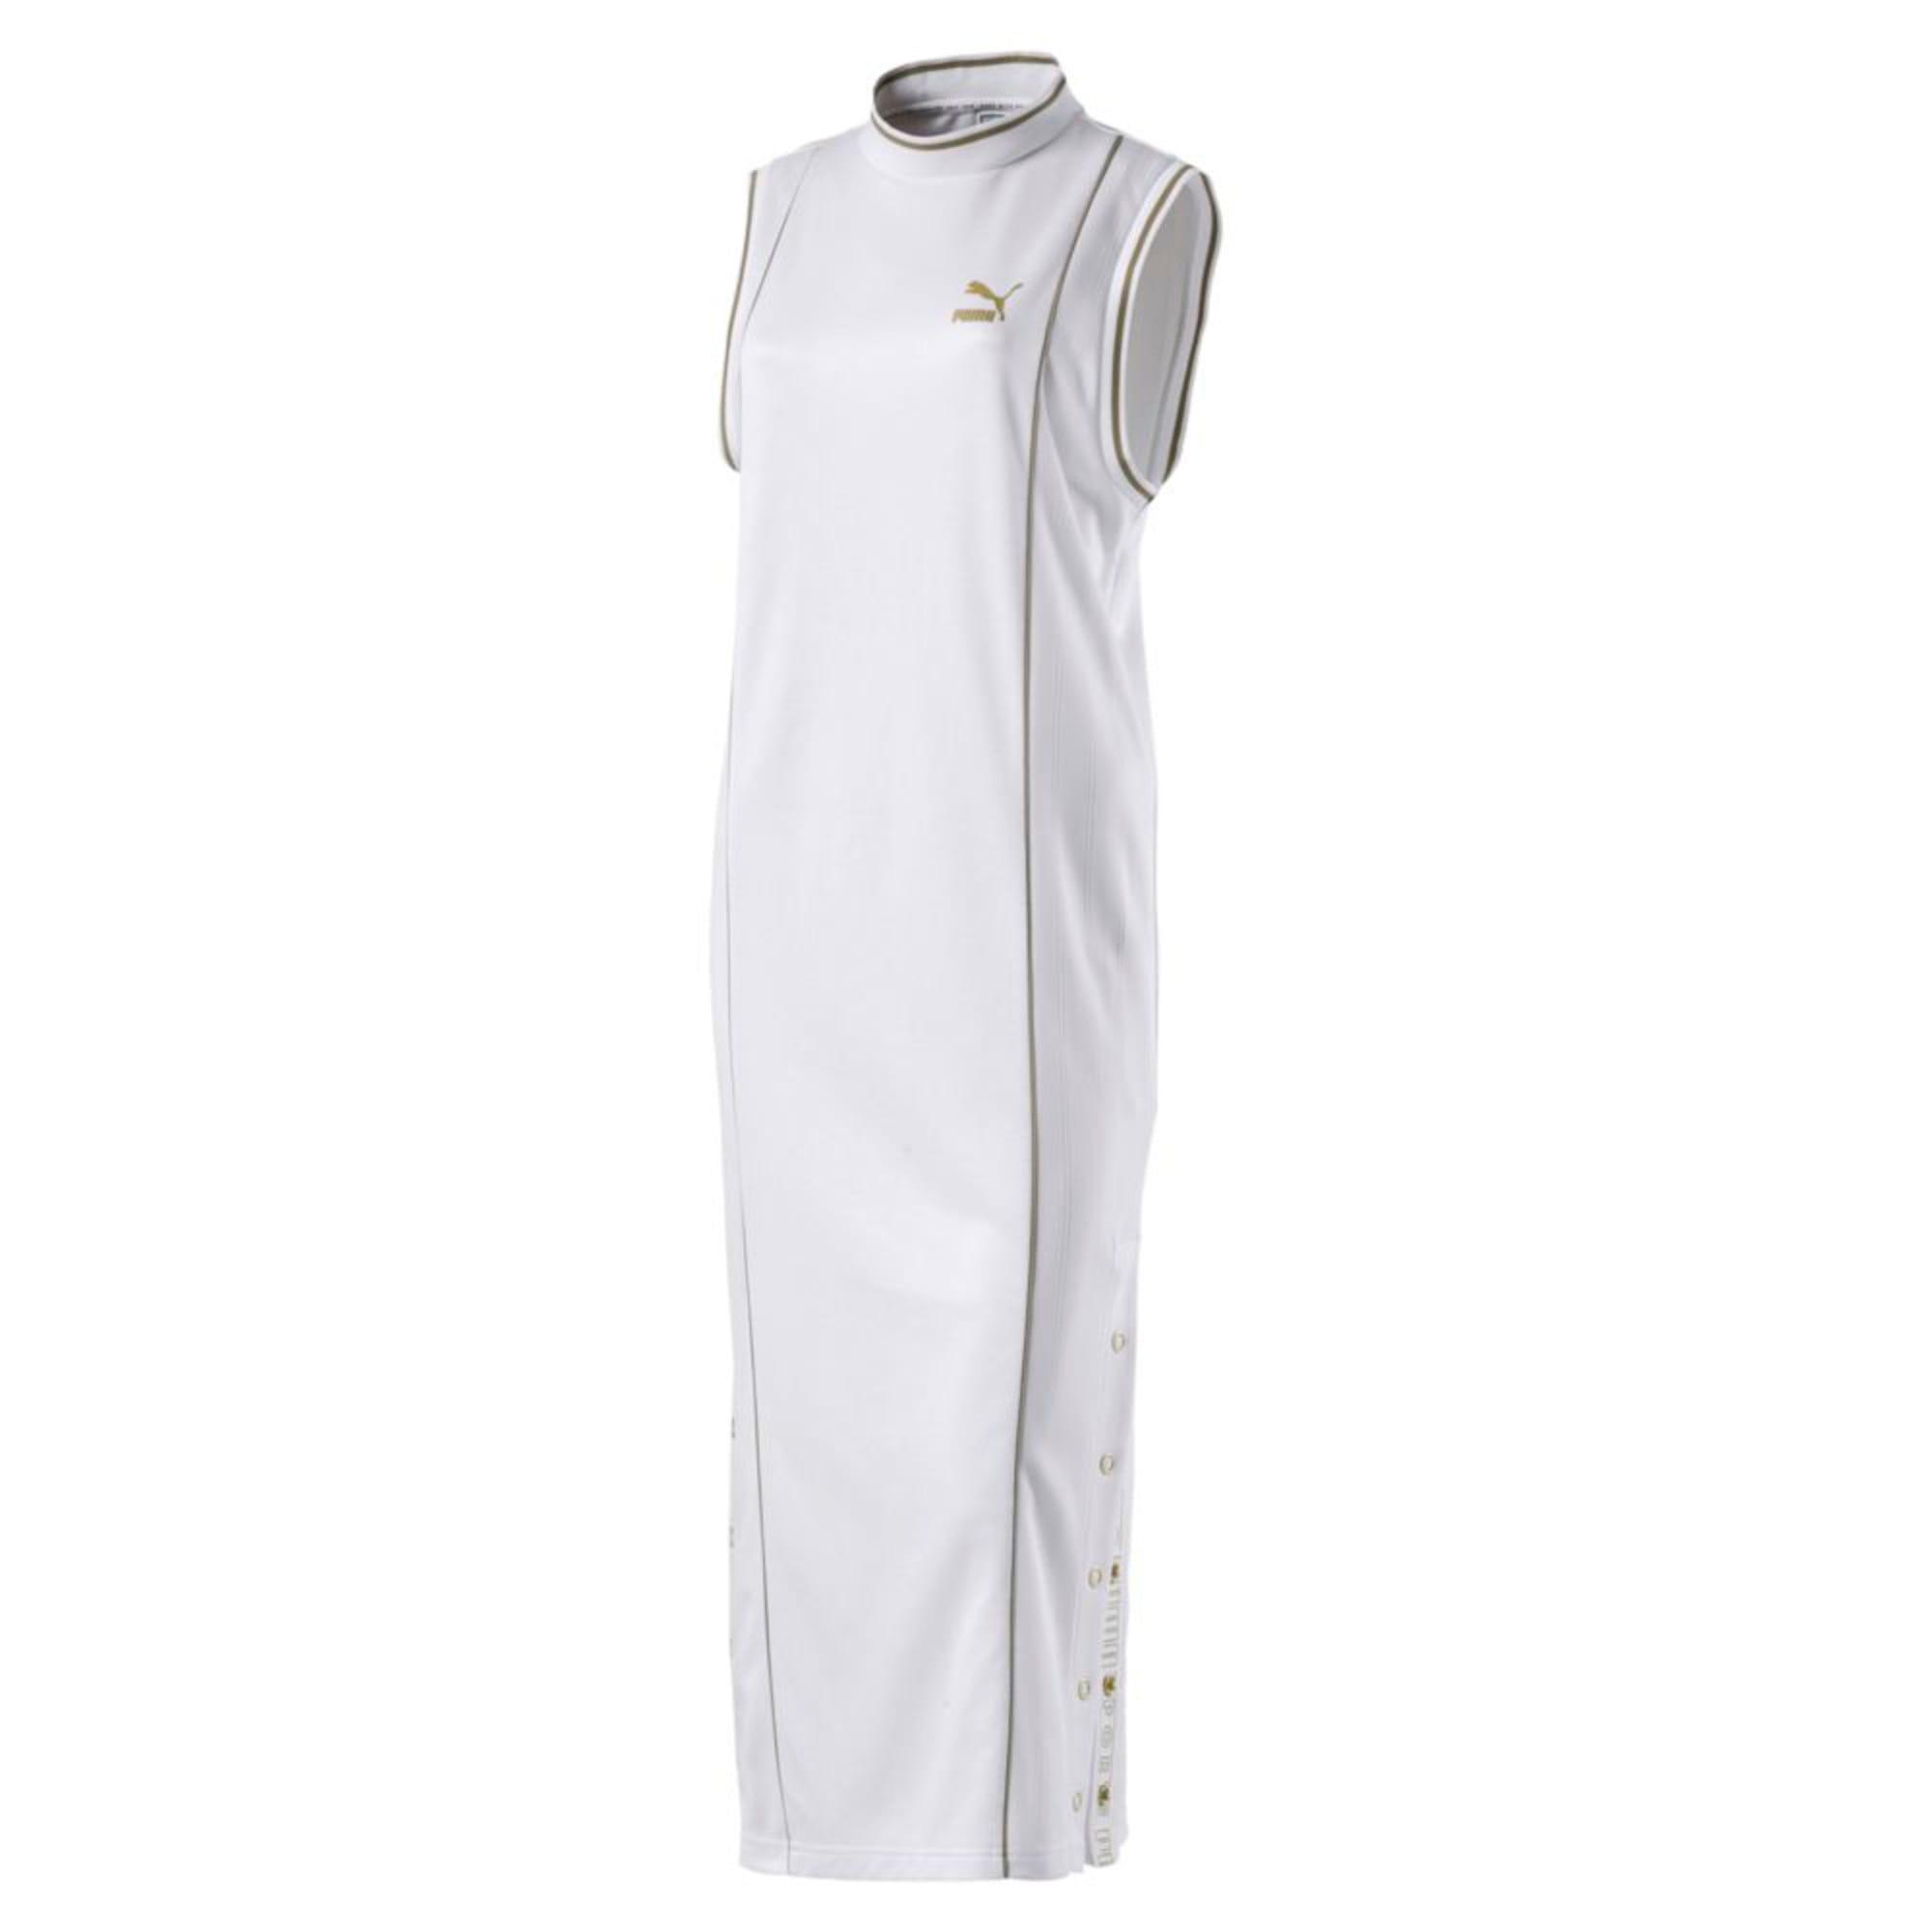 Thumbnail 1 of Retro Women's Dress, Puma White, medium-IND